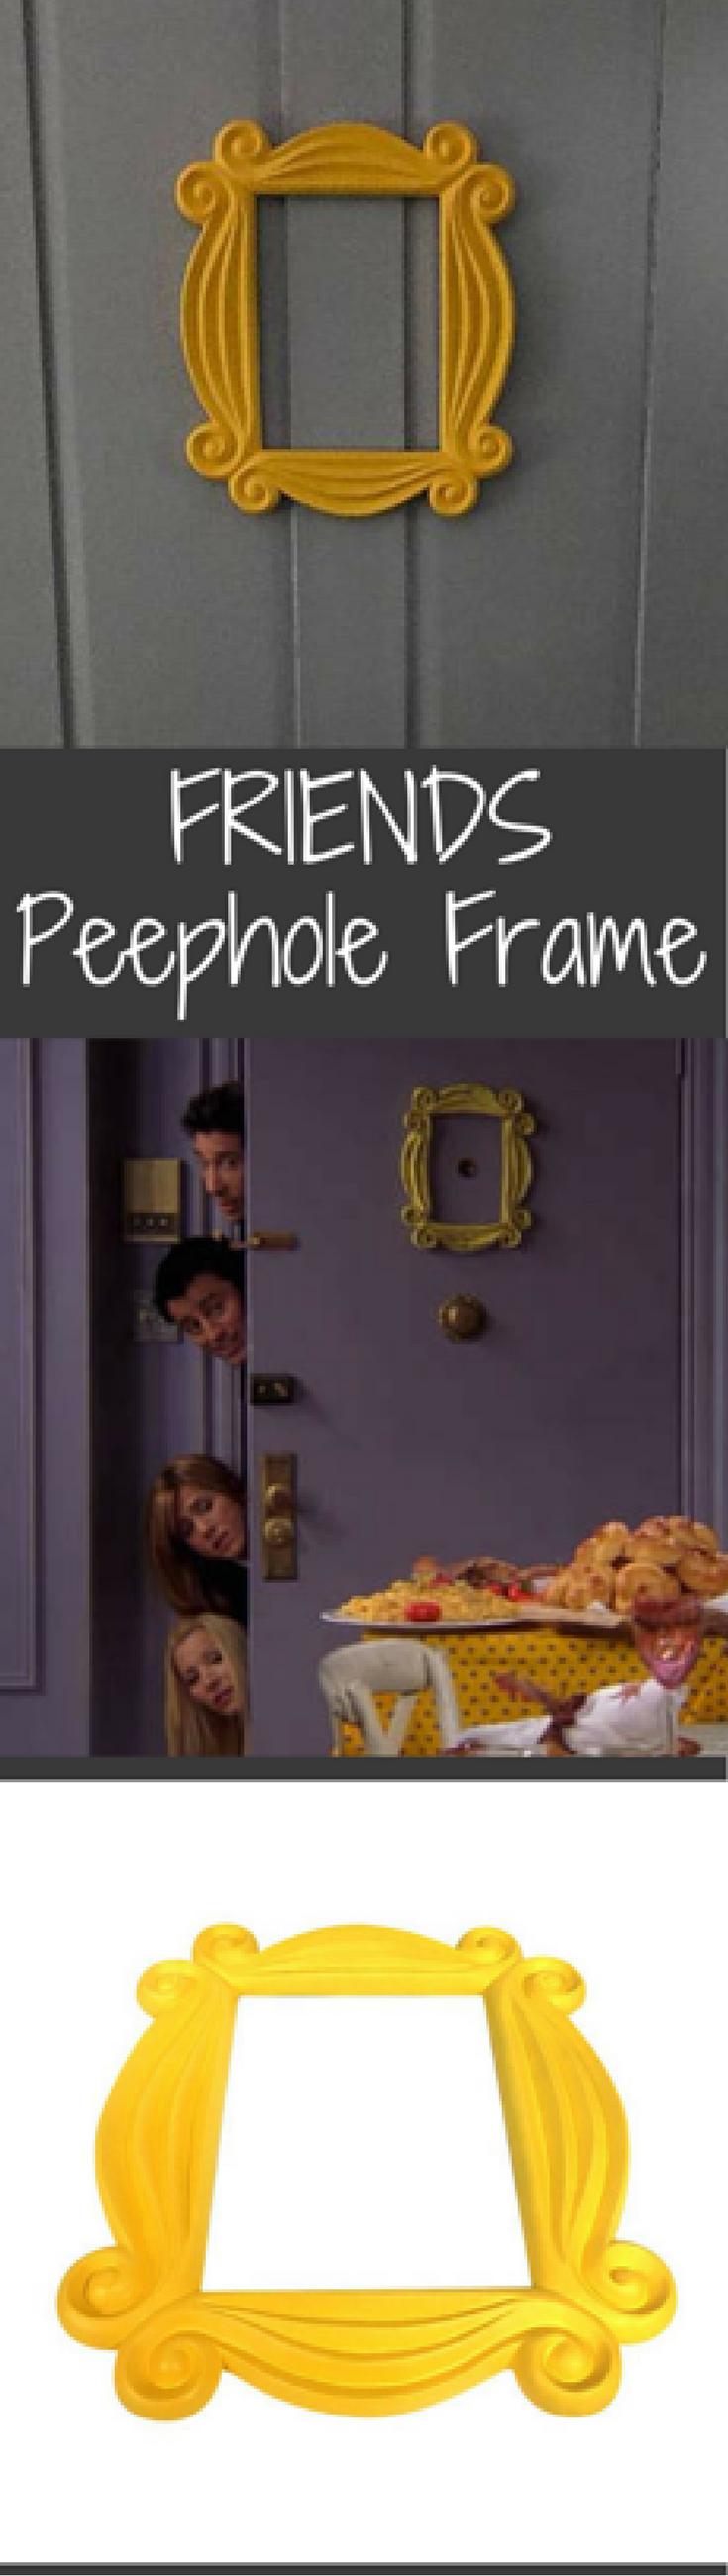 Friends Replica Frame, Yellow Peephole Frame, Friends Yellow Door ...